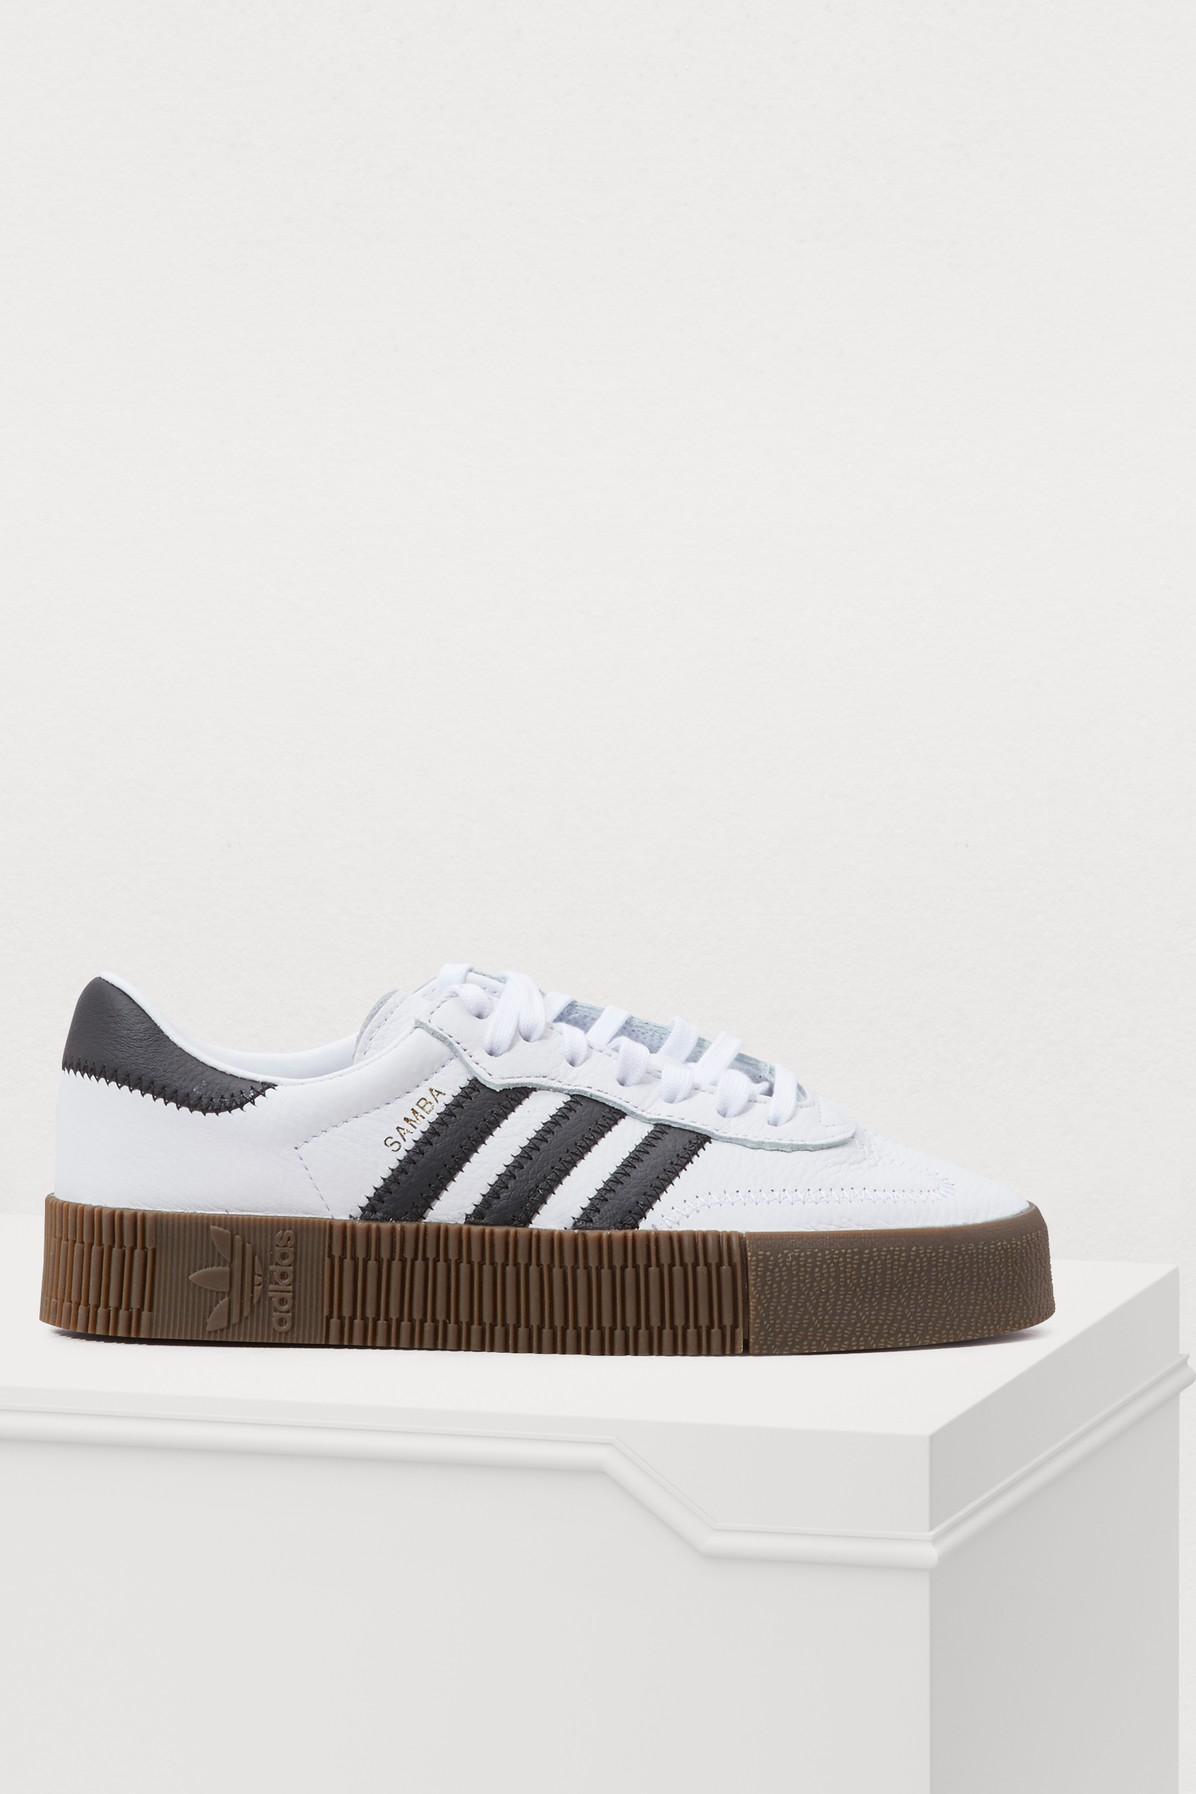 Adidas Originals Samba Rose Sneakers In White With Dark Gum Sole - White dd3f074b5